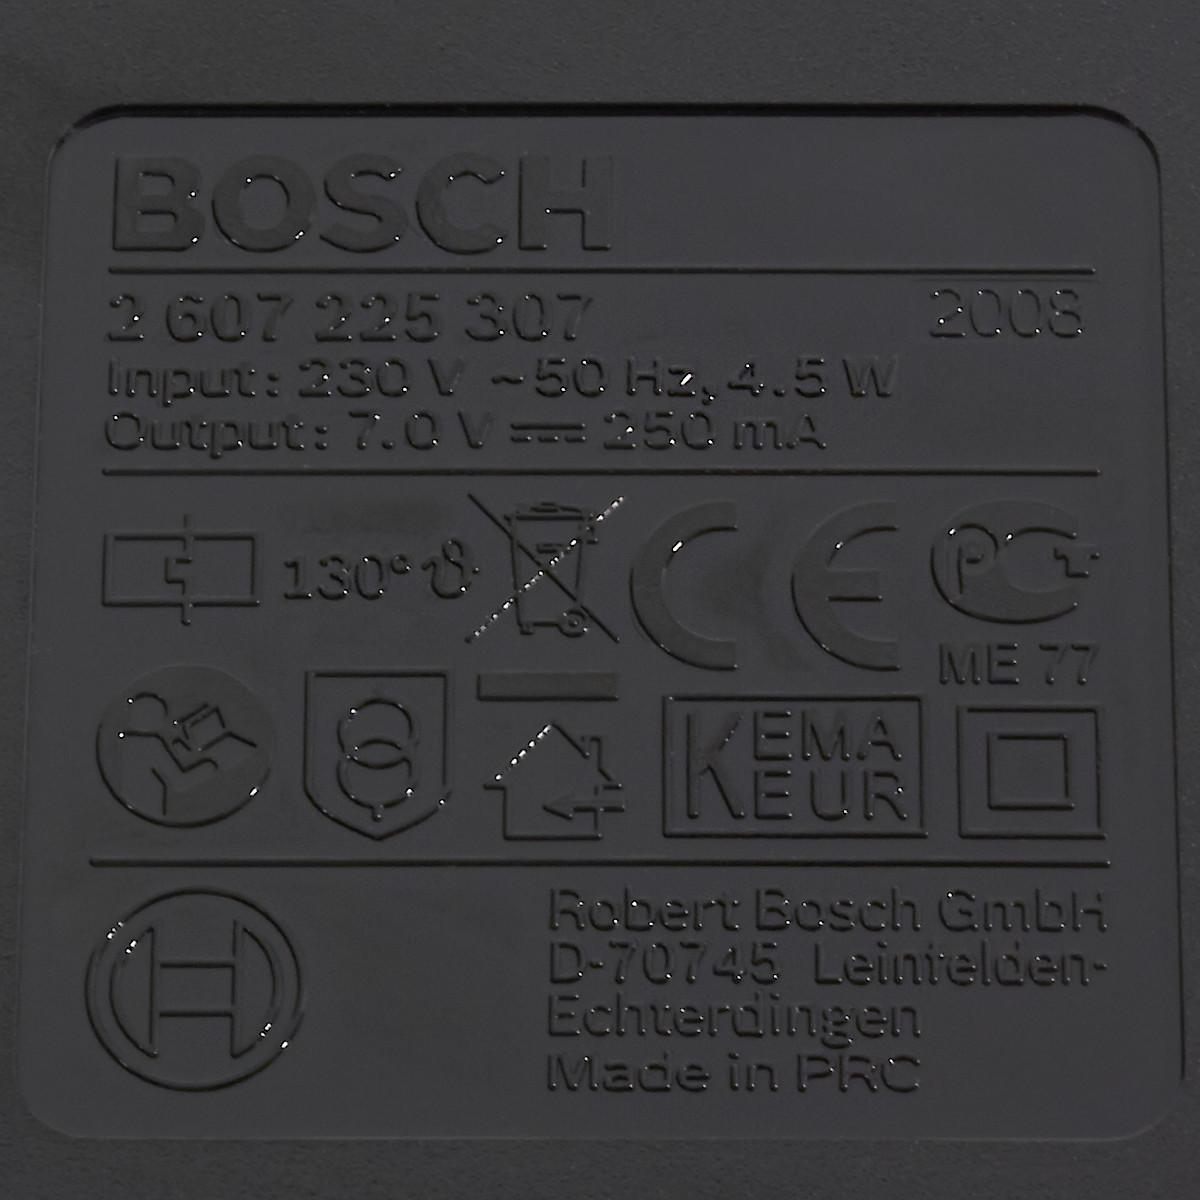 Bosch ISIO IIIAnniversary lader | Clas Ohlson